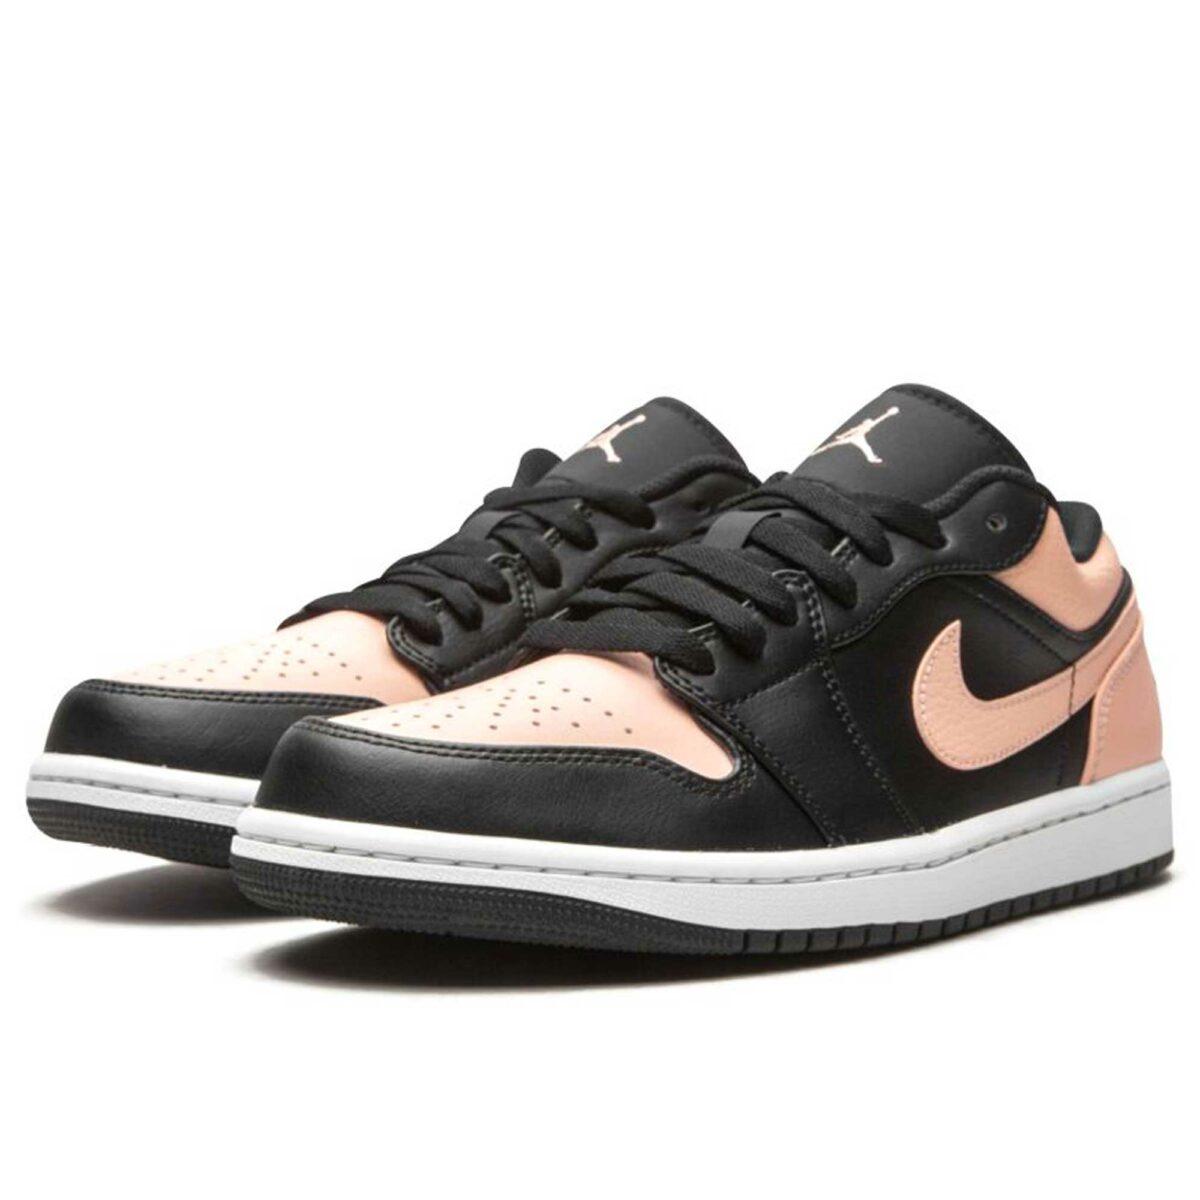 nike air Jordan 1 low crimson tint 553558_034 купить